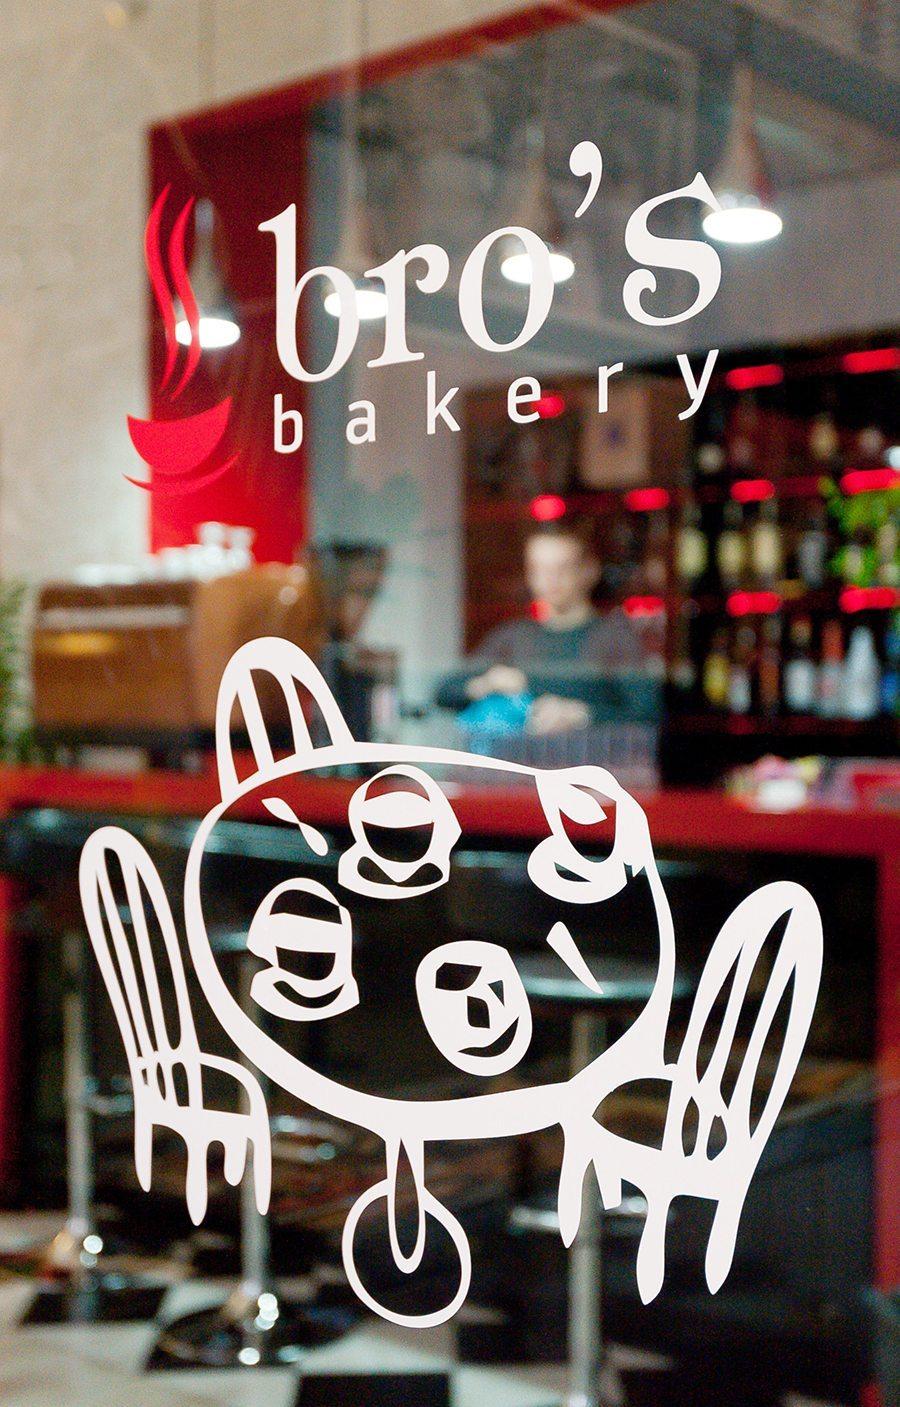 2 Bro's bakery